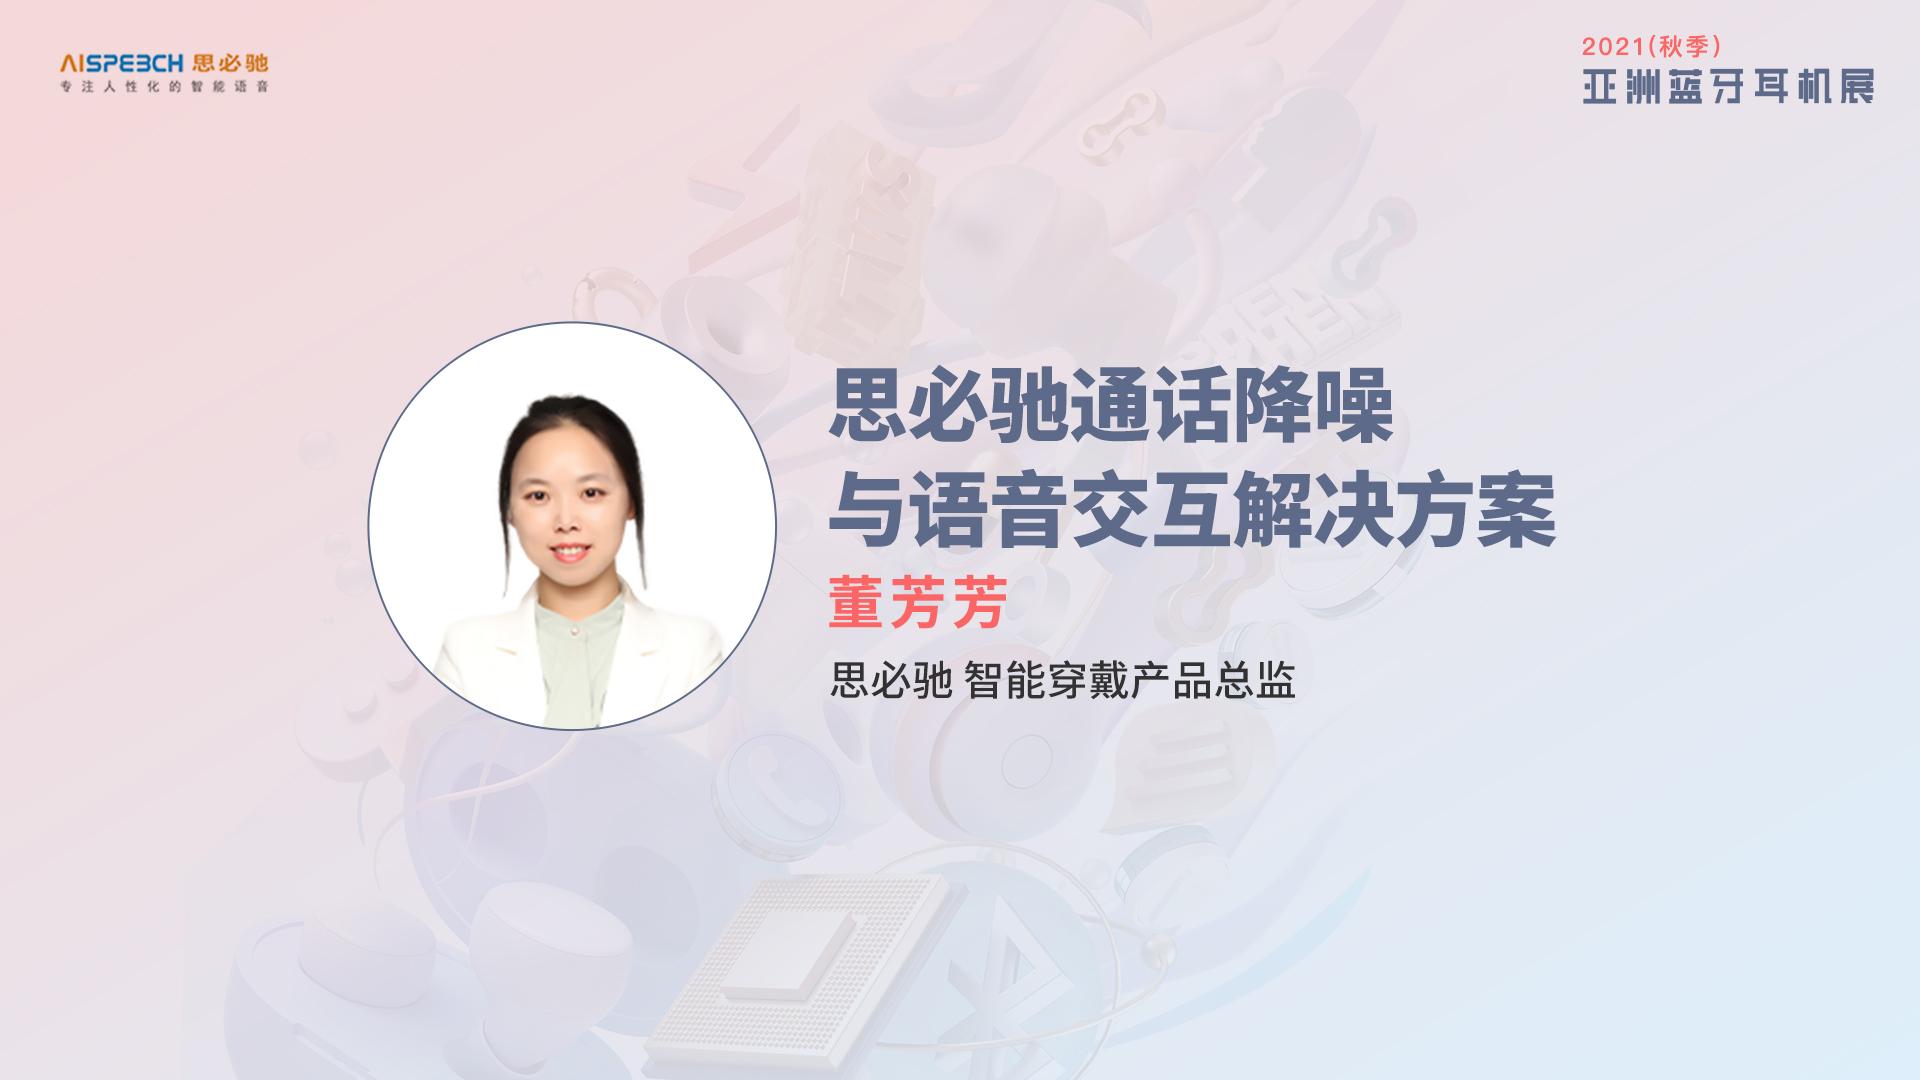 PPT下载:2021(秋季)亚洲蓝牙耳机展-我爱音频网